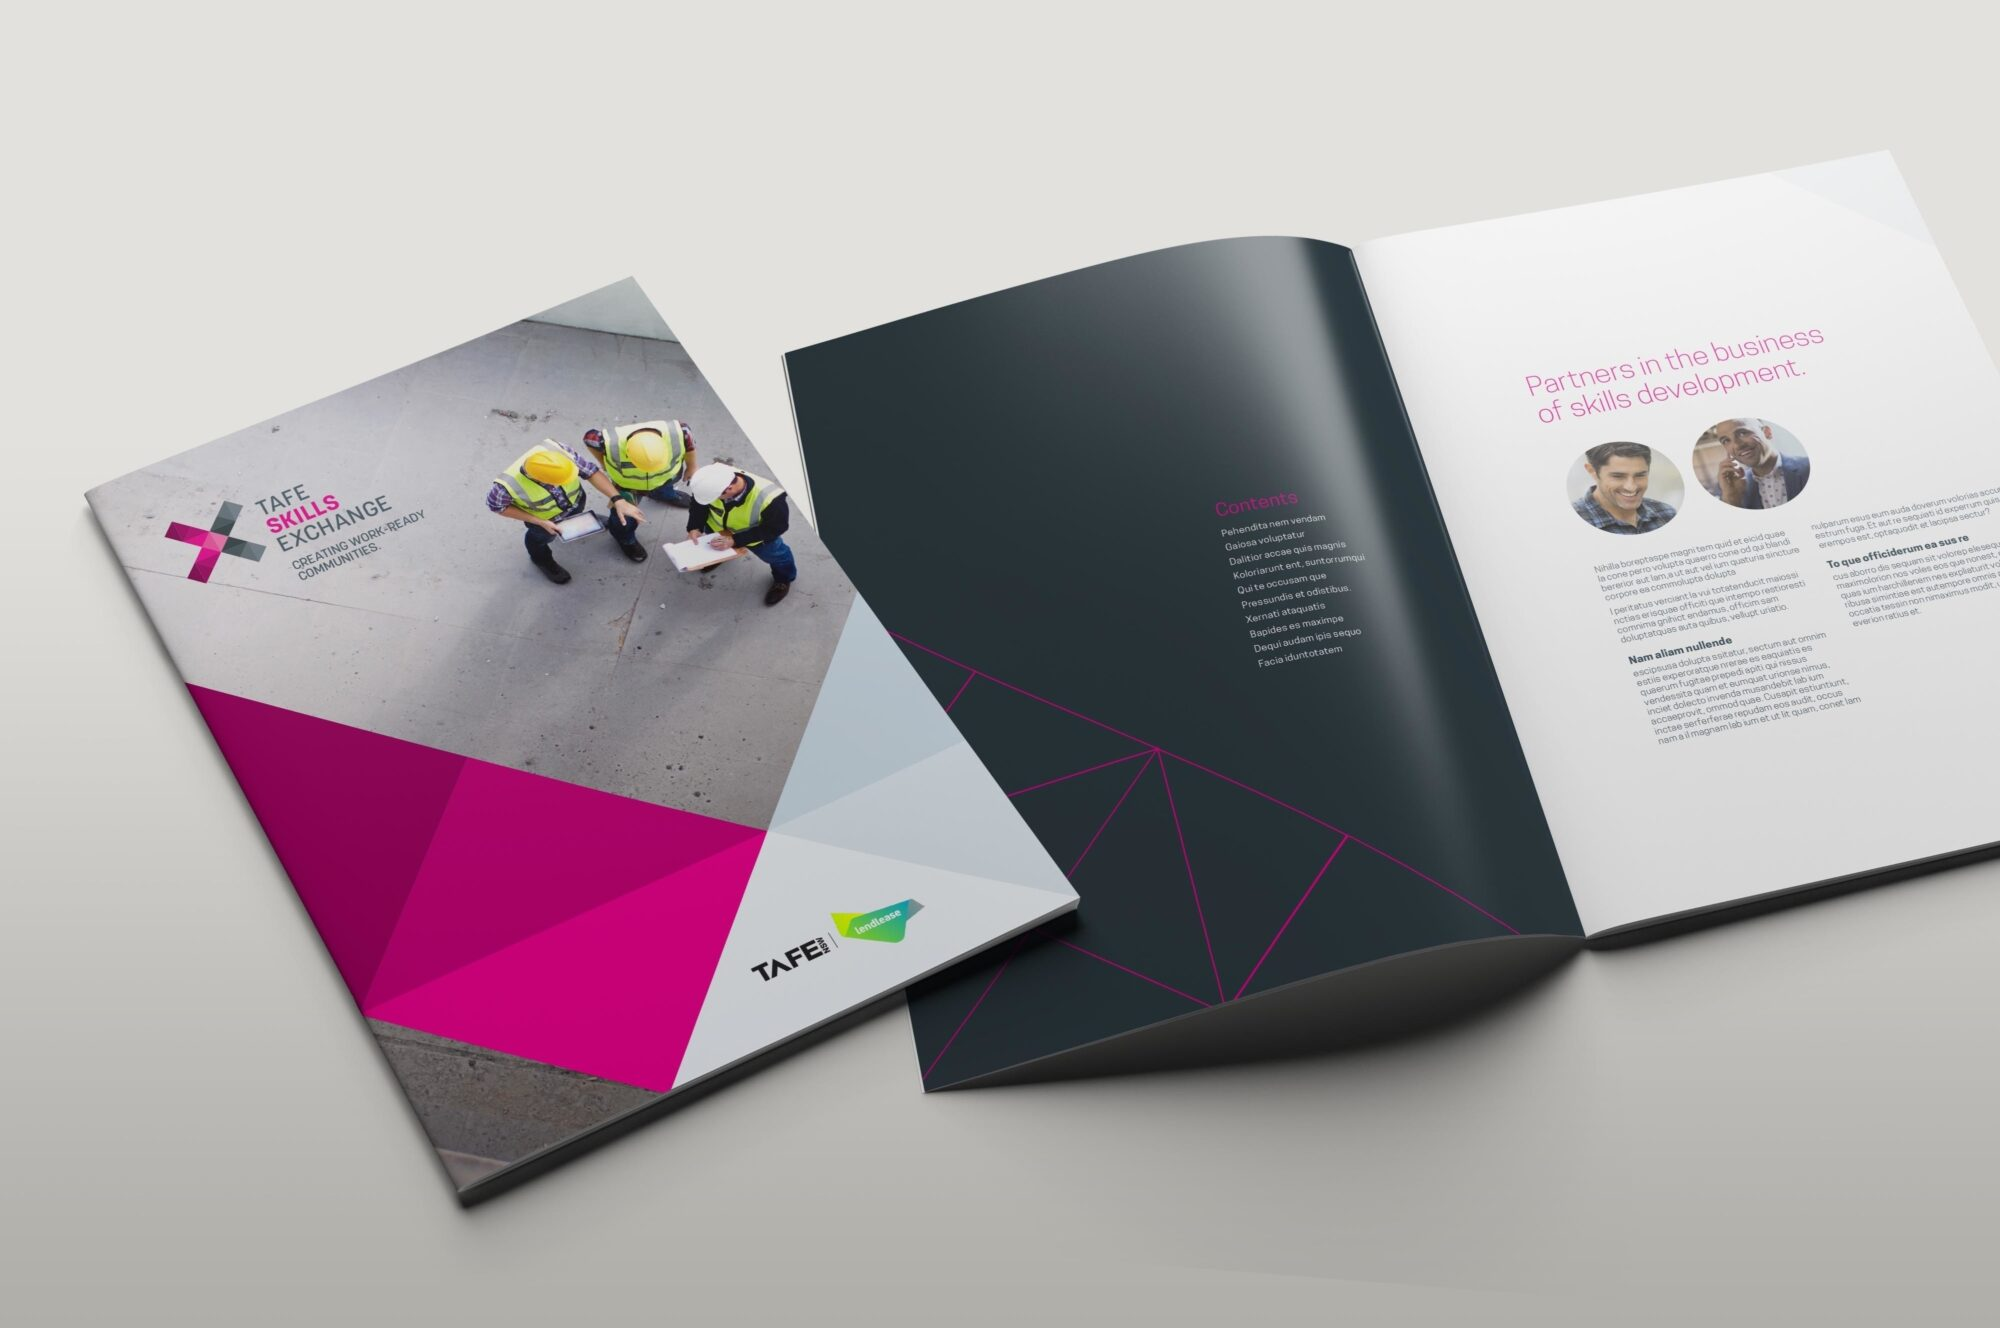 Tafe BSX publication spread